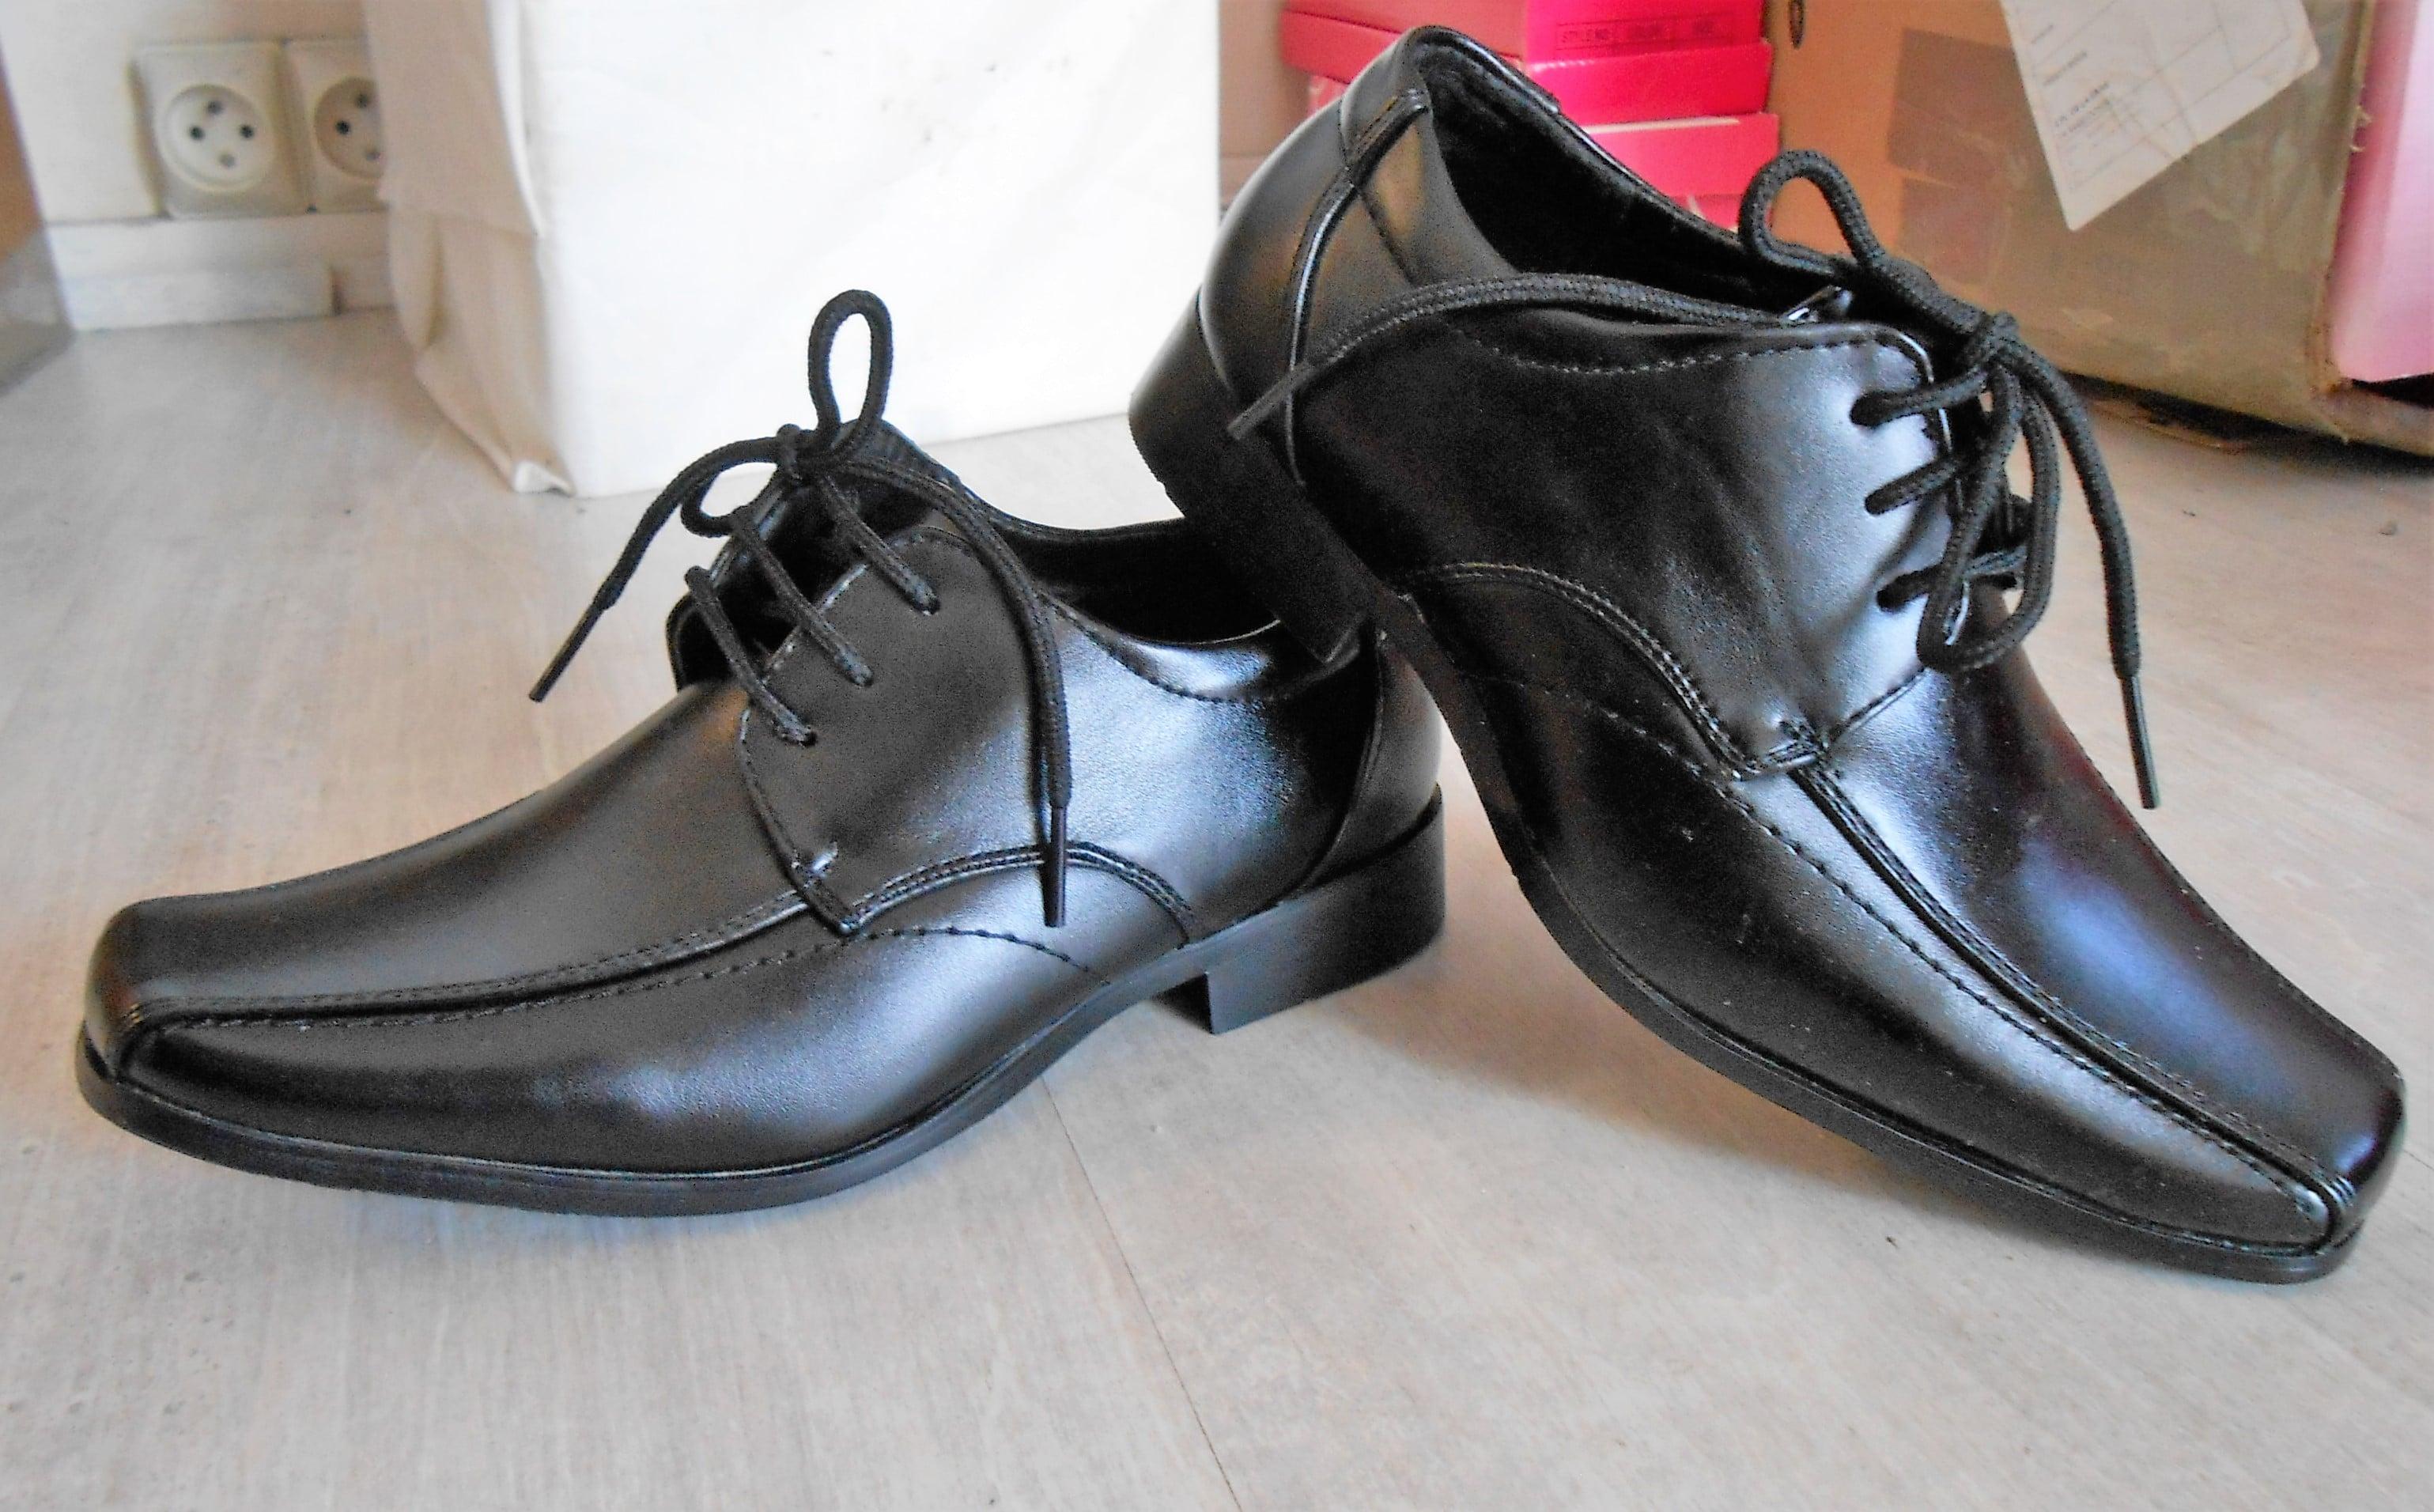 DSCN0995 NOIR lacets bout italienne Y050